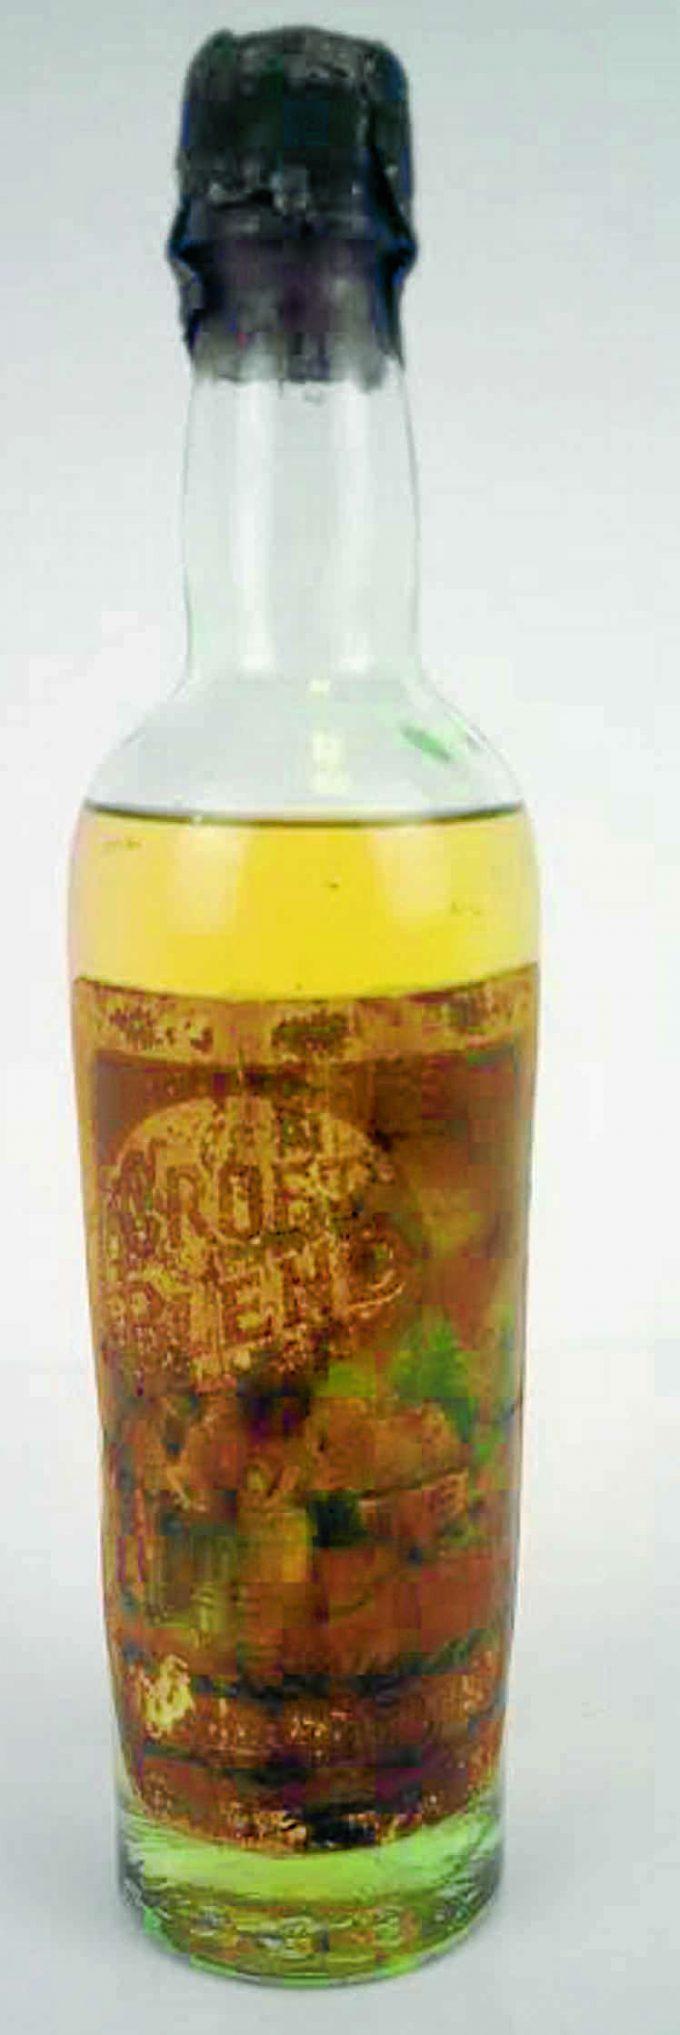 war whisky